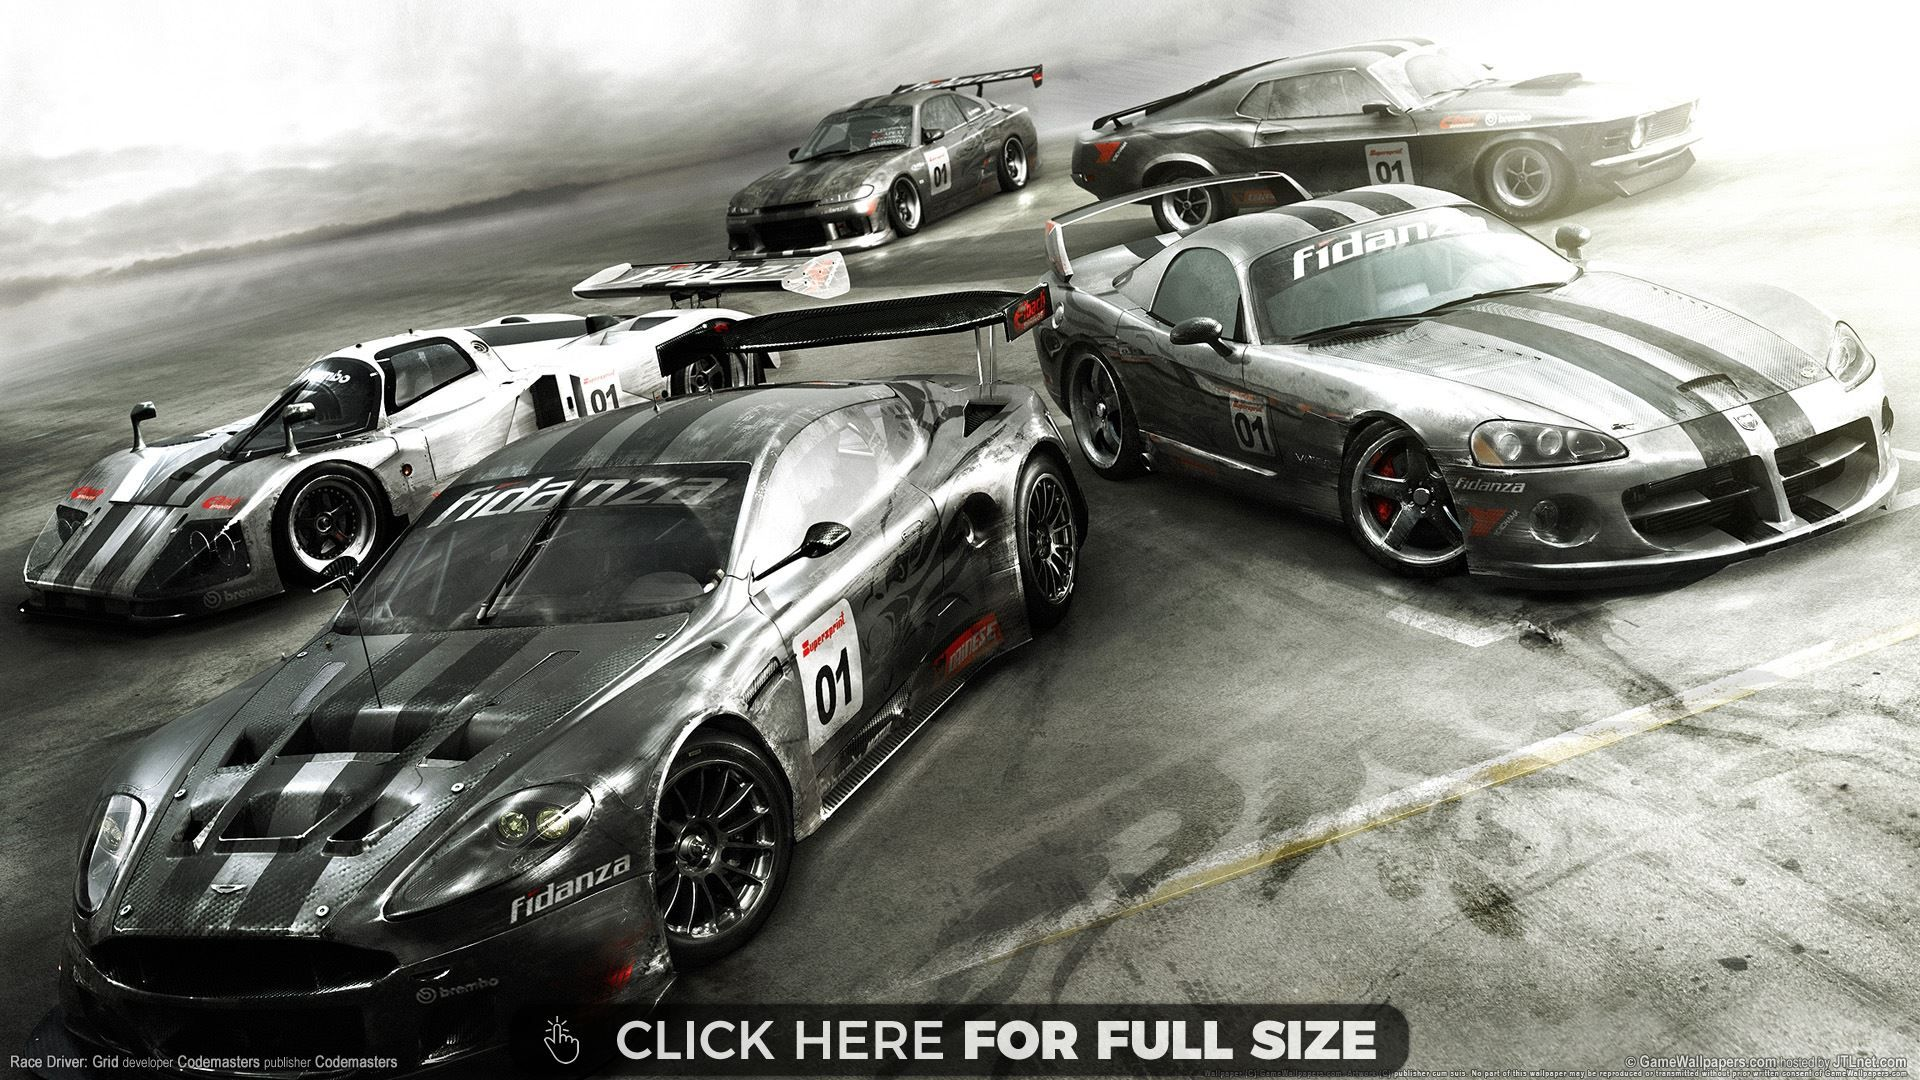 Race Driver Grid 26804 Wallpaper